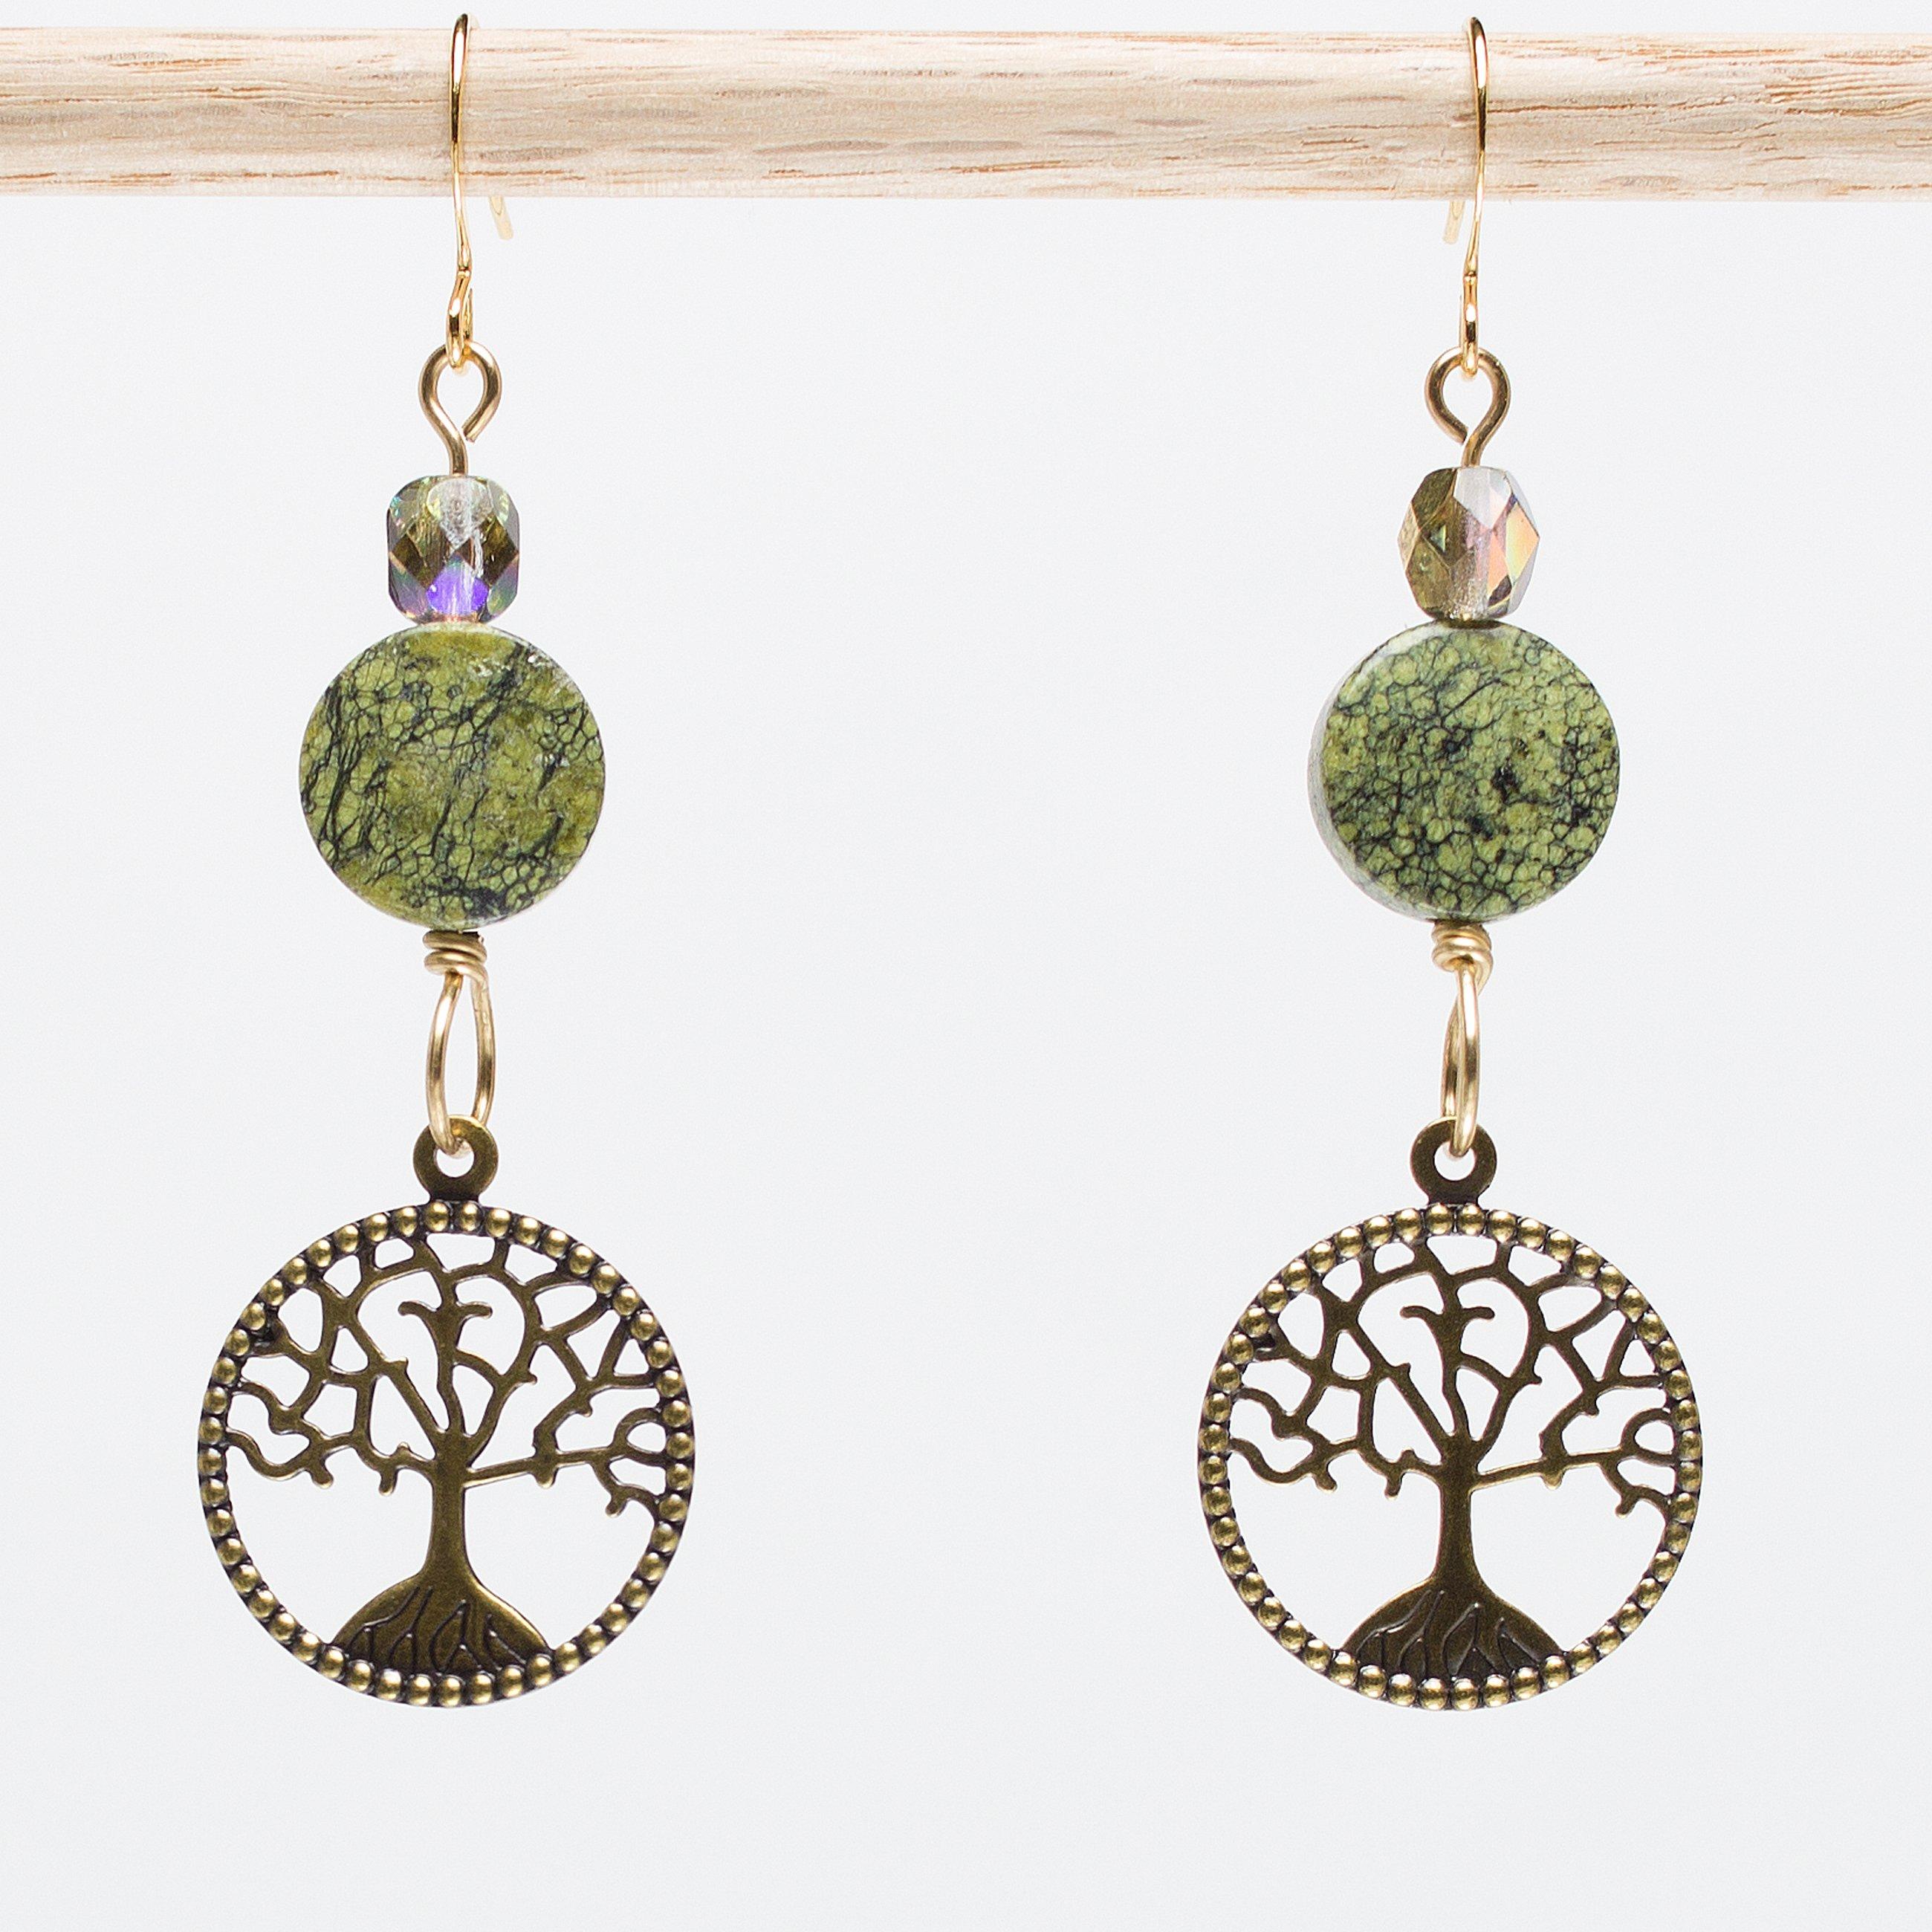 Seredipi-Tree Earrings